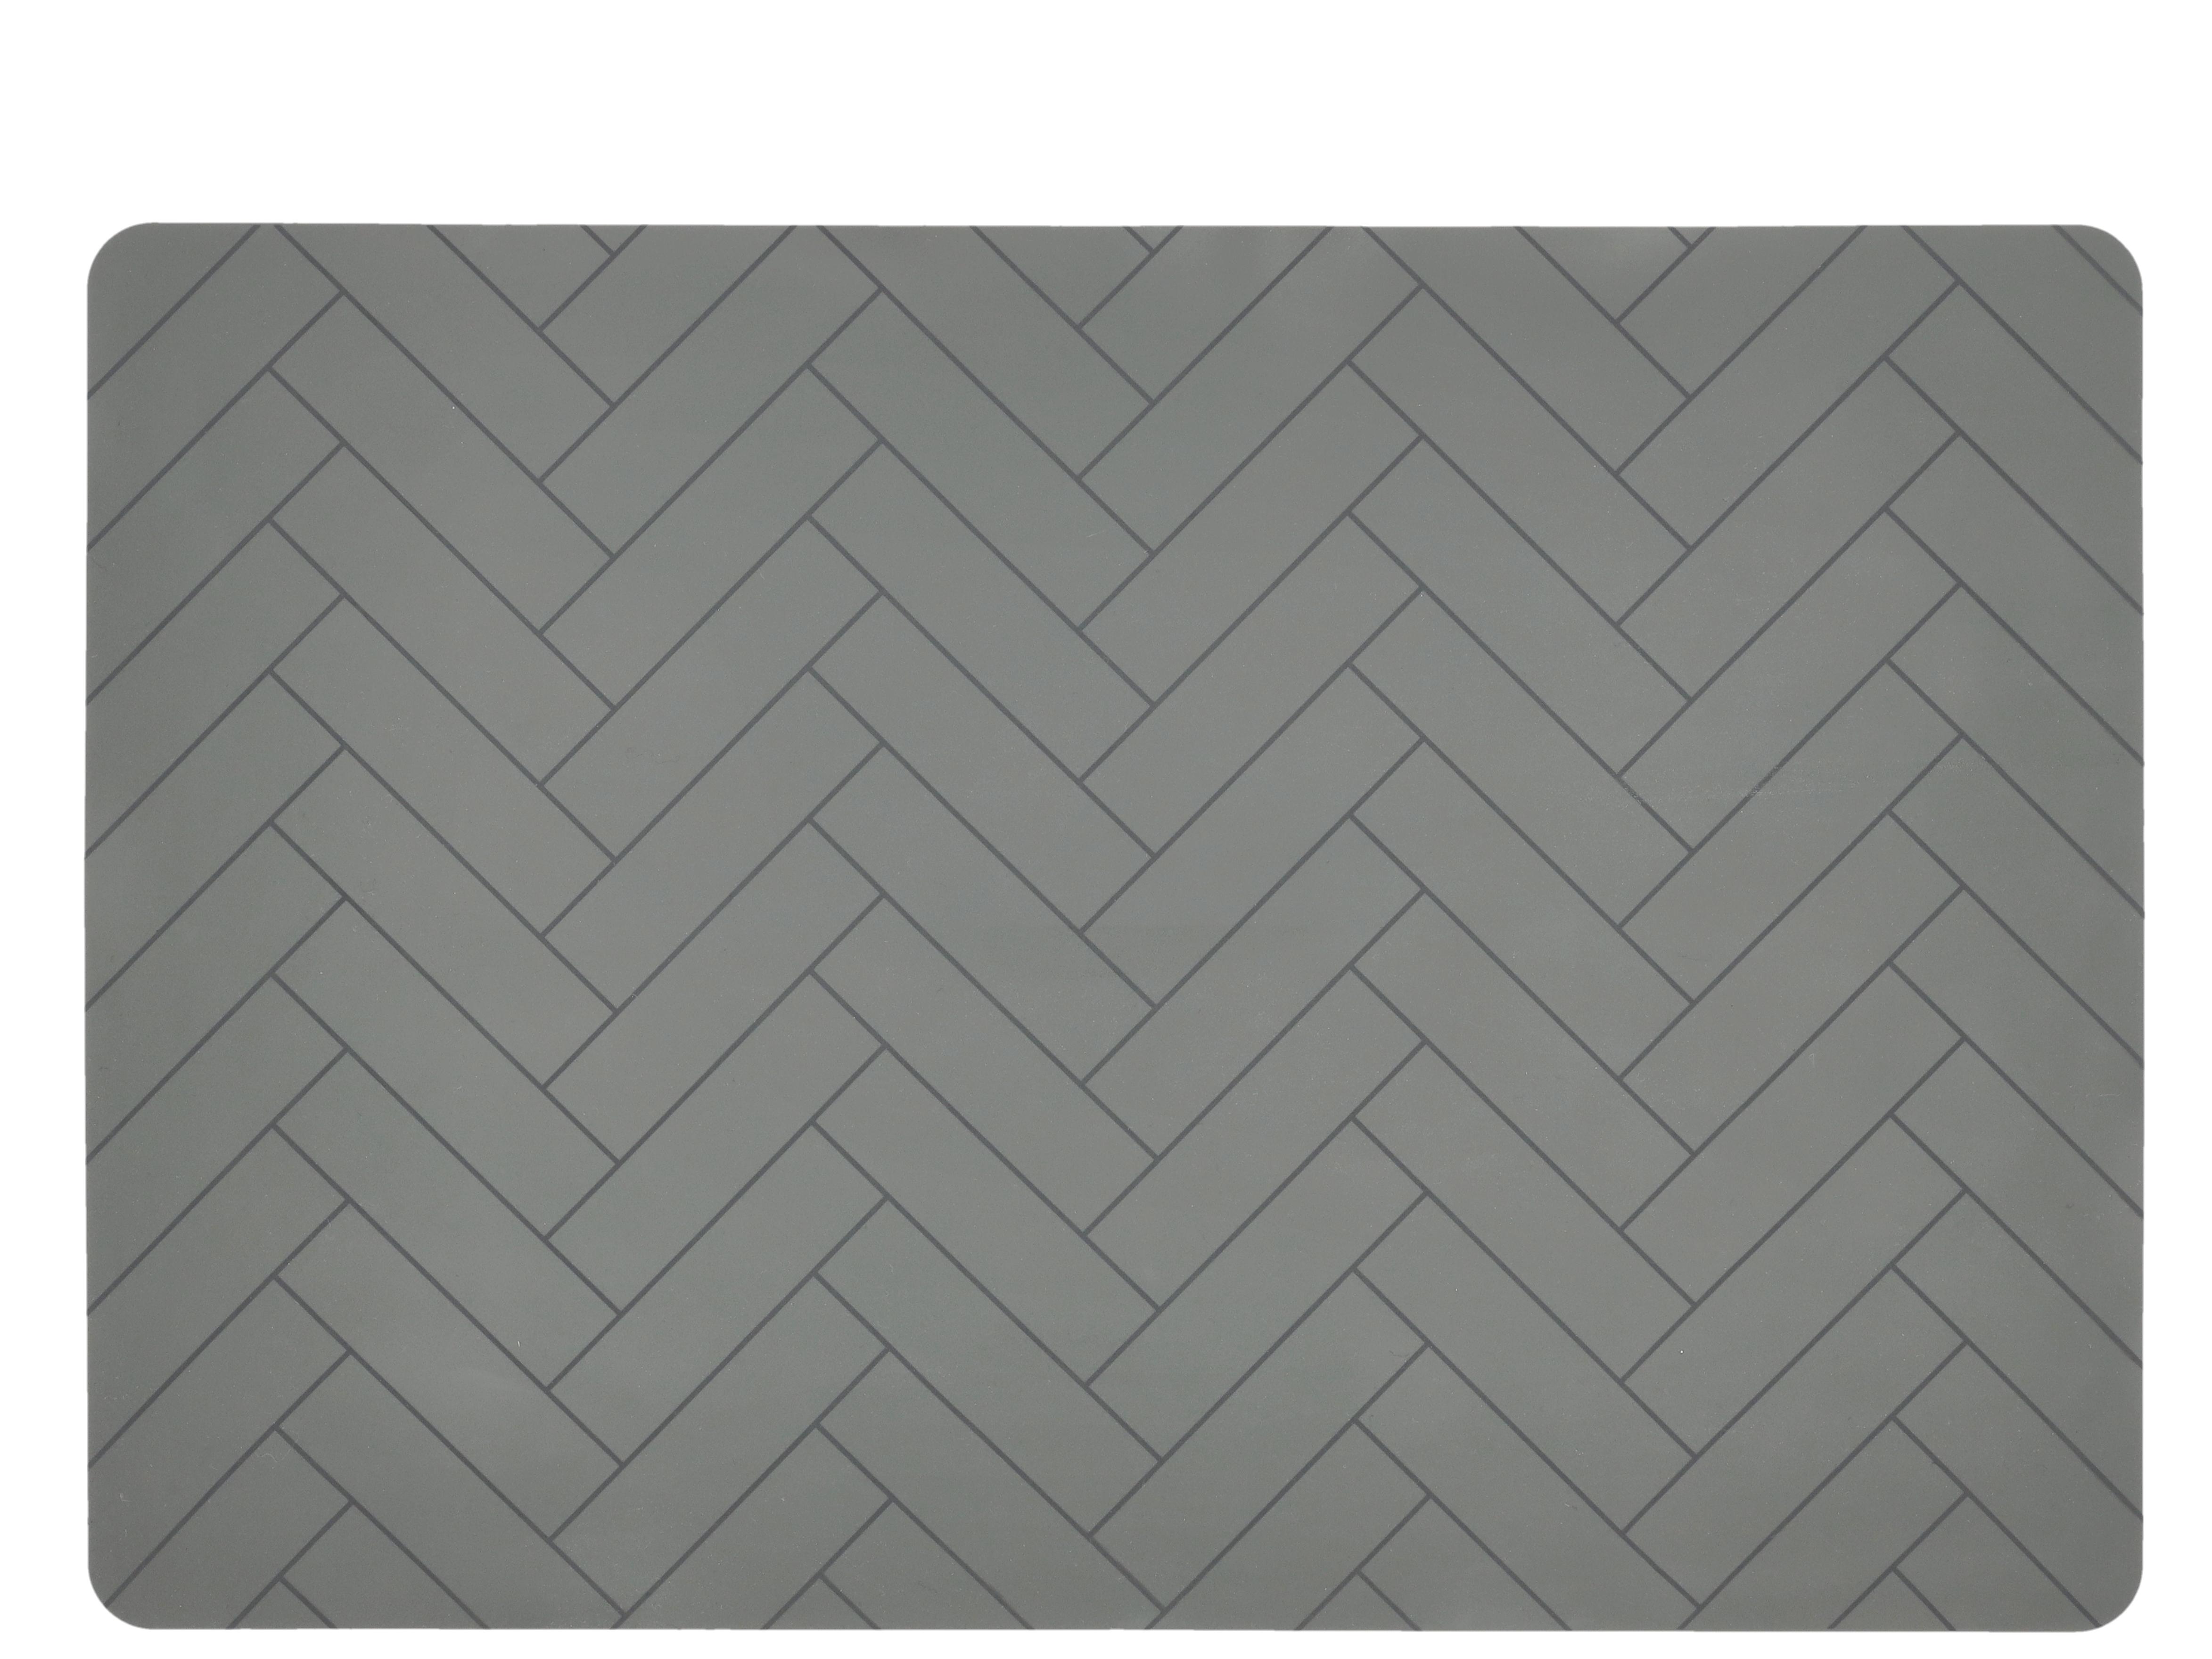 Södahl Tiles dækkeserviet, 33x48 cm, skovgrøn